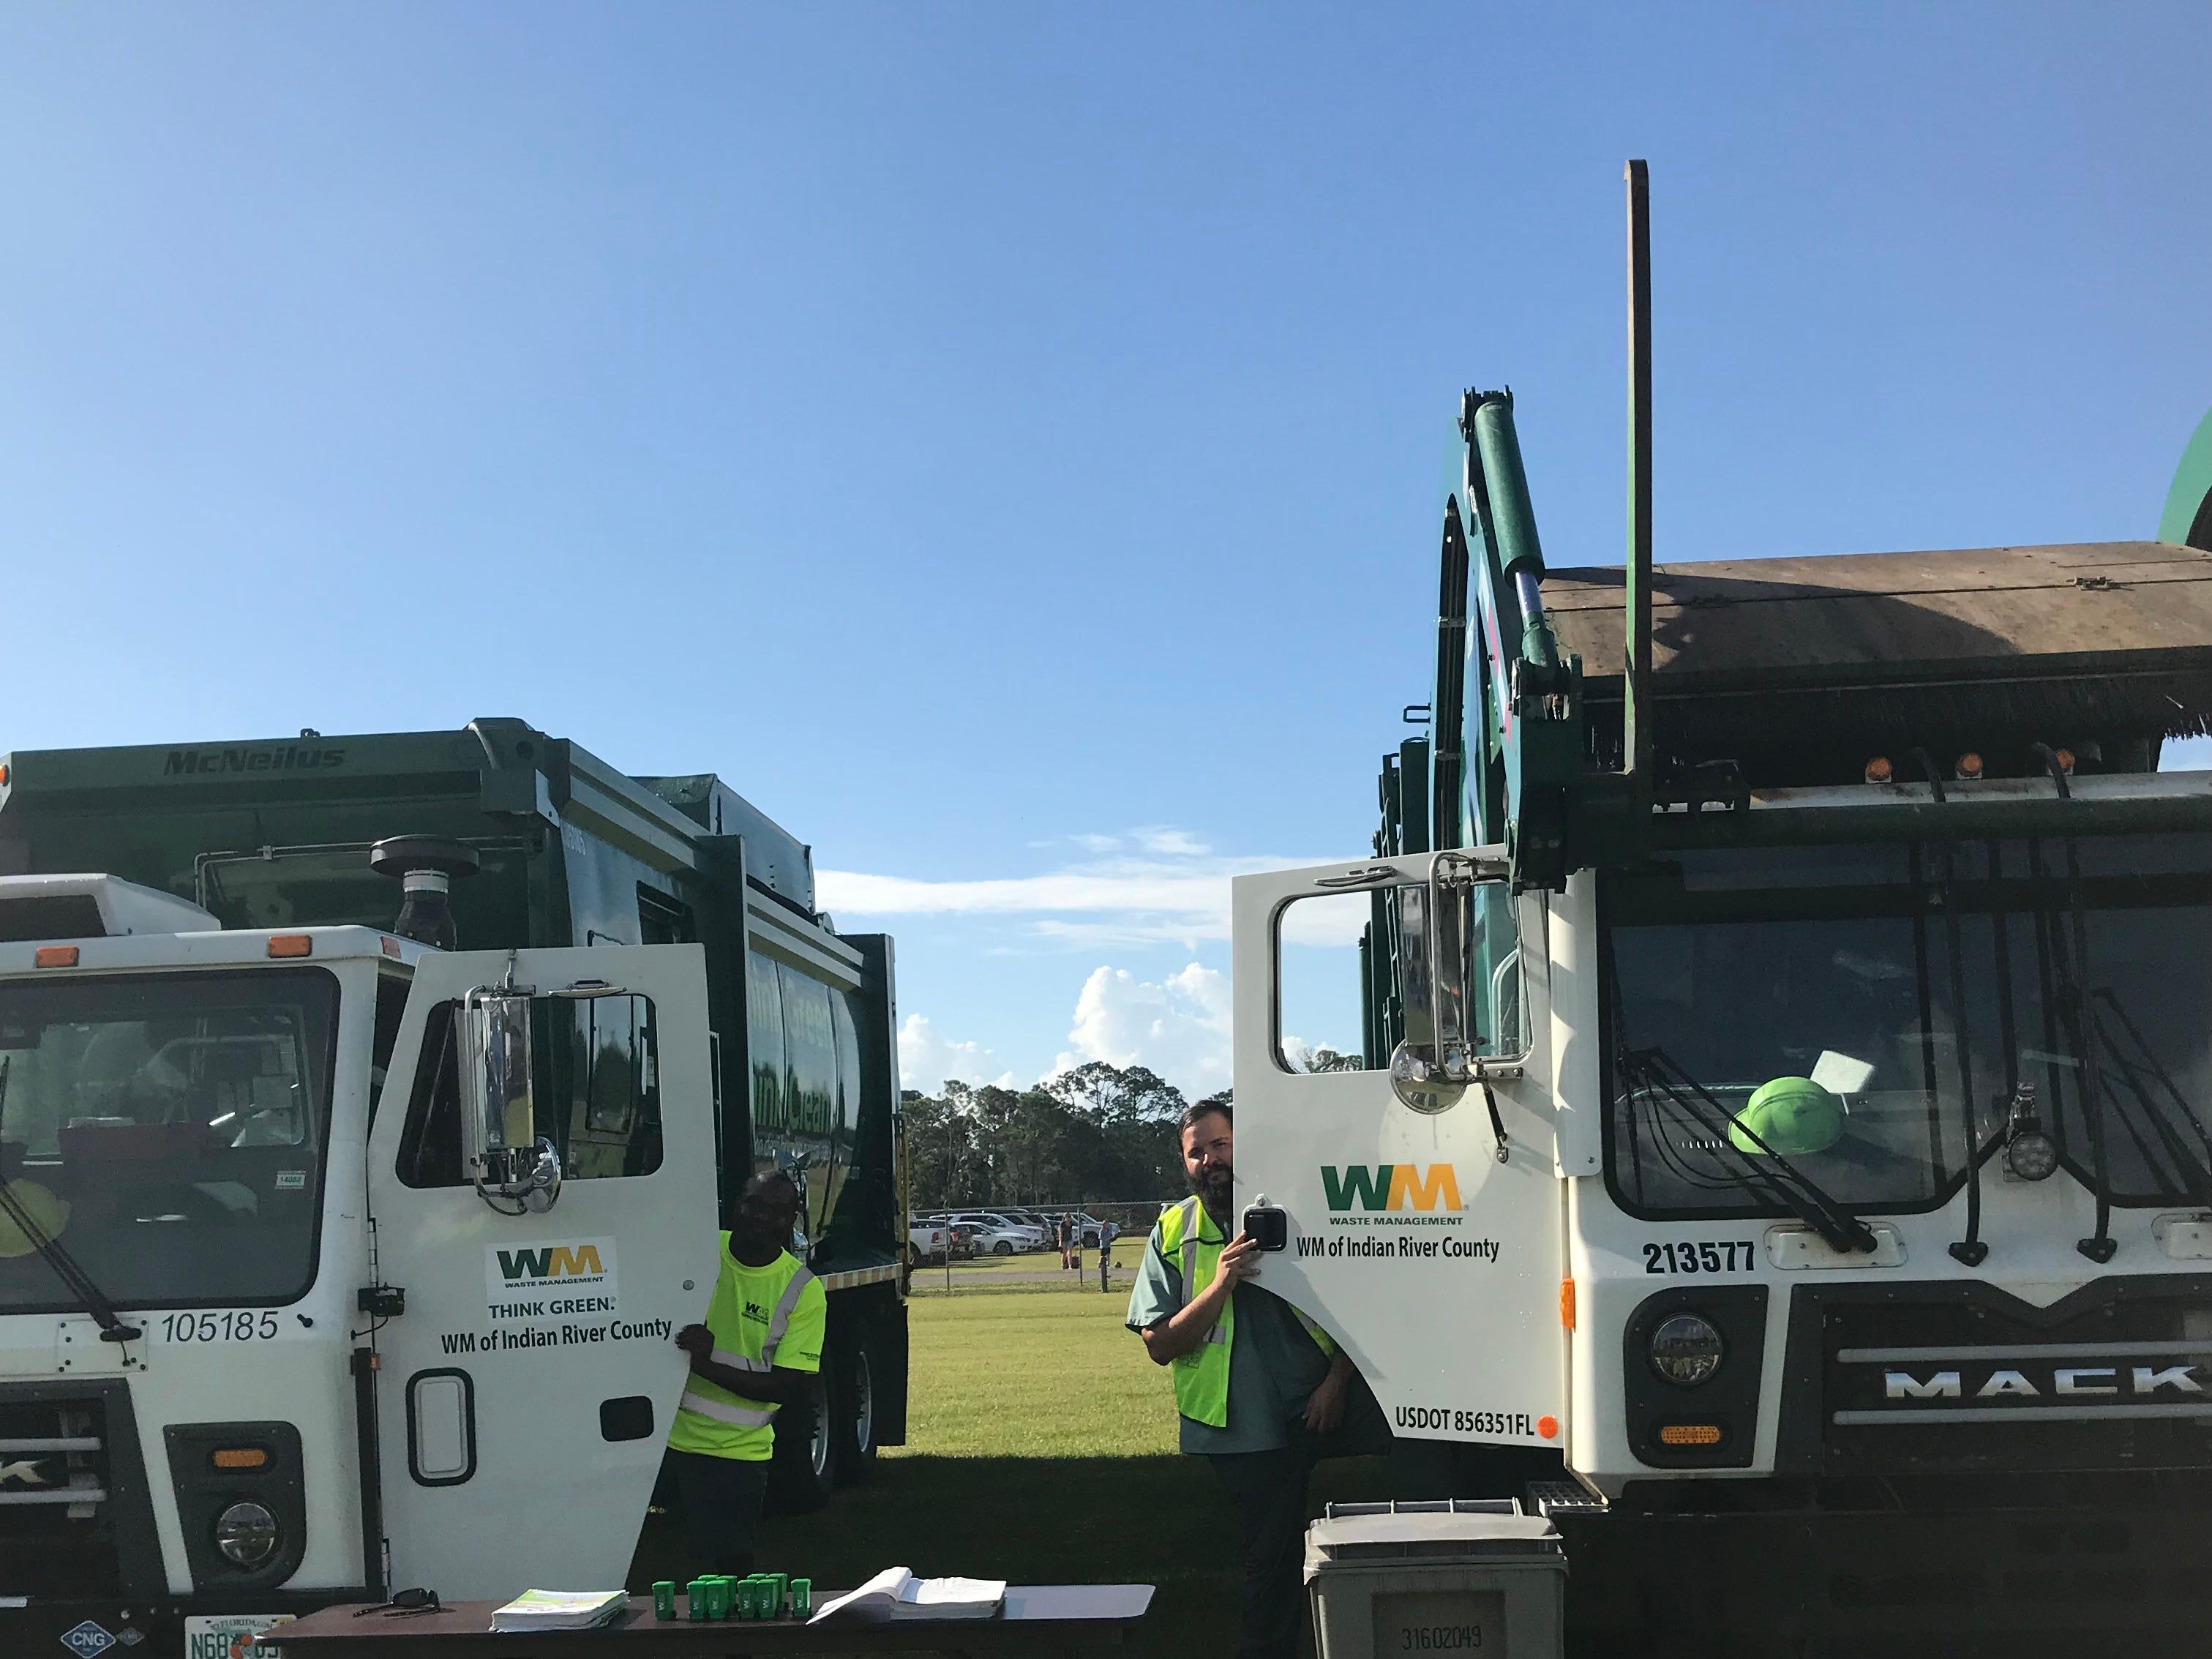 Waste Management's Andrew Hammond and Luis Gernea